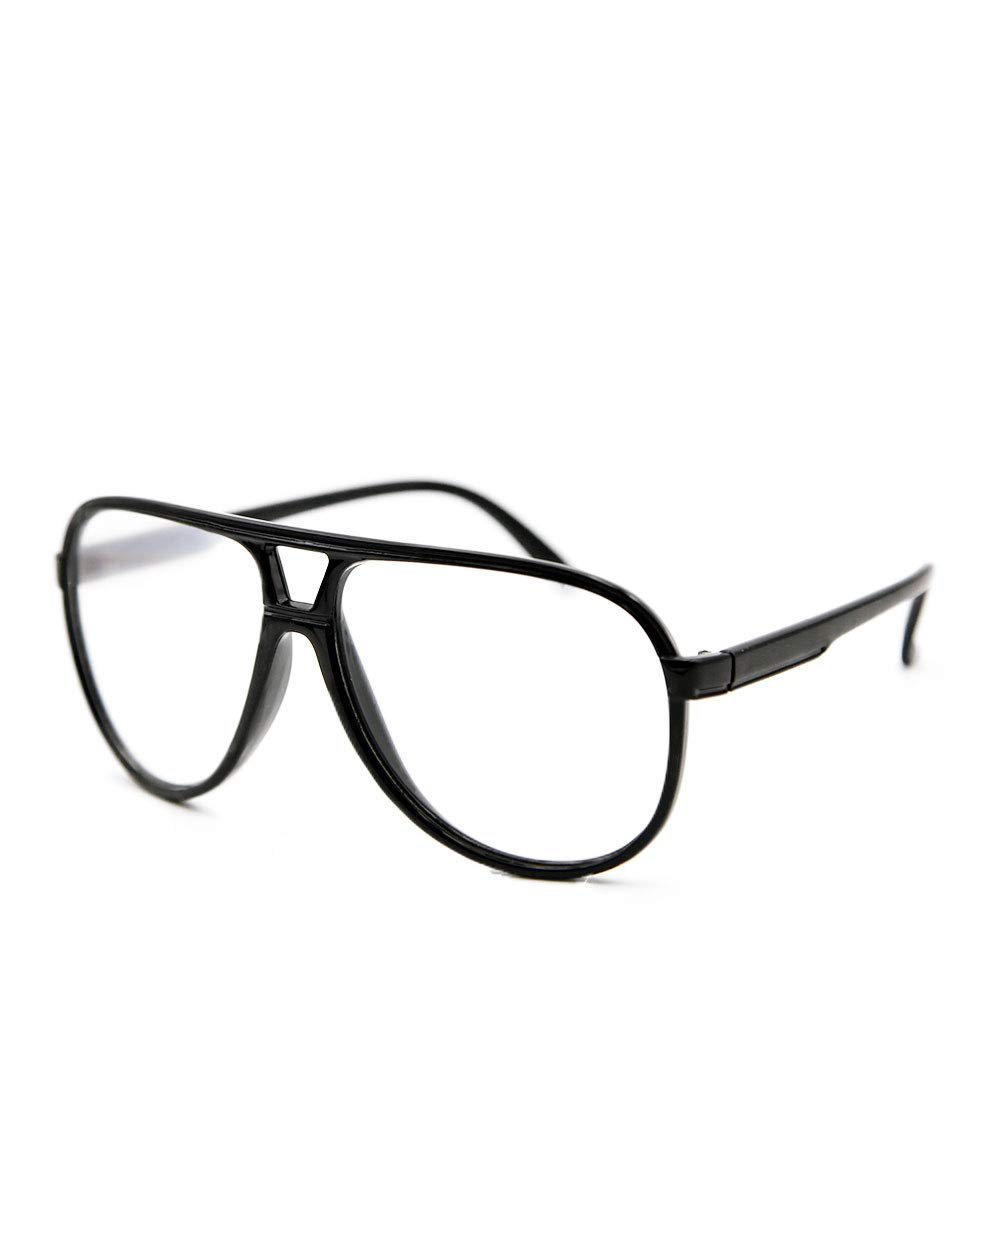 EmazingLights Gone Gonzo Diffraction Glasses (Black)